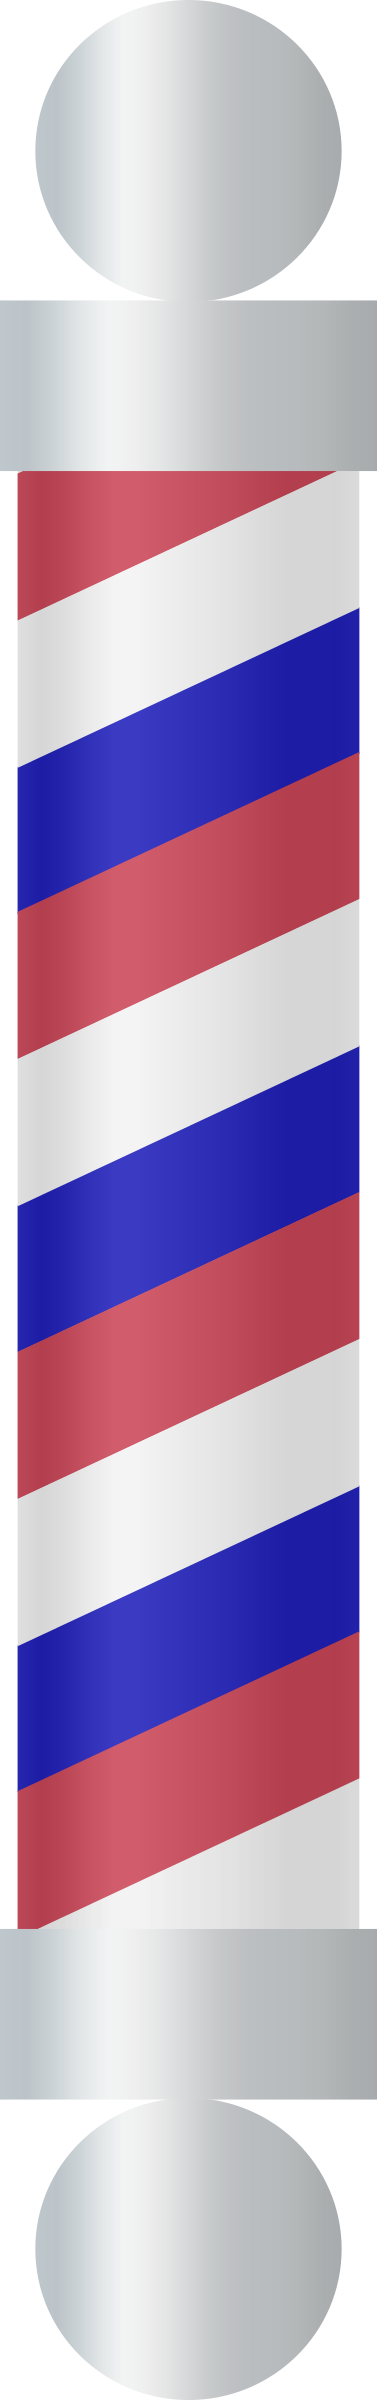 Barber Pole Barber Pole Barber Pole